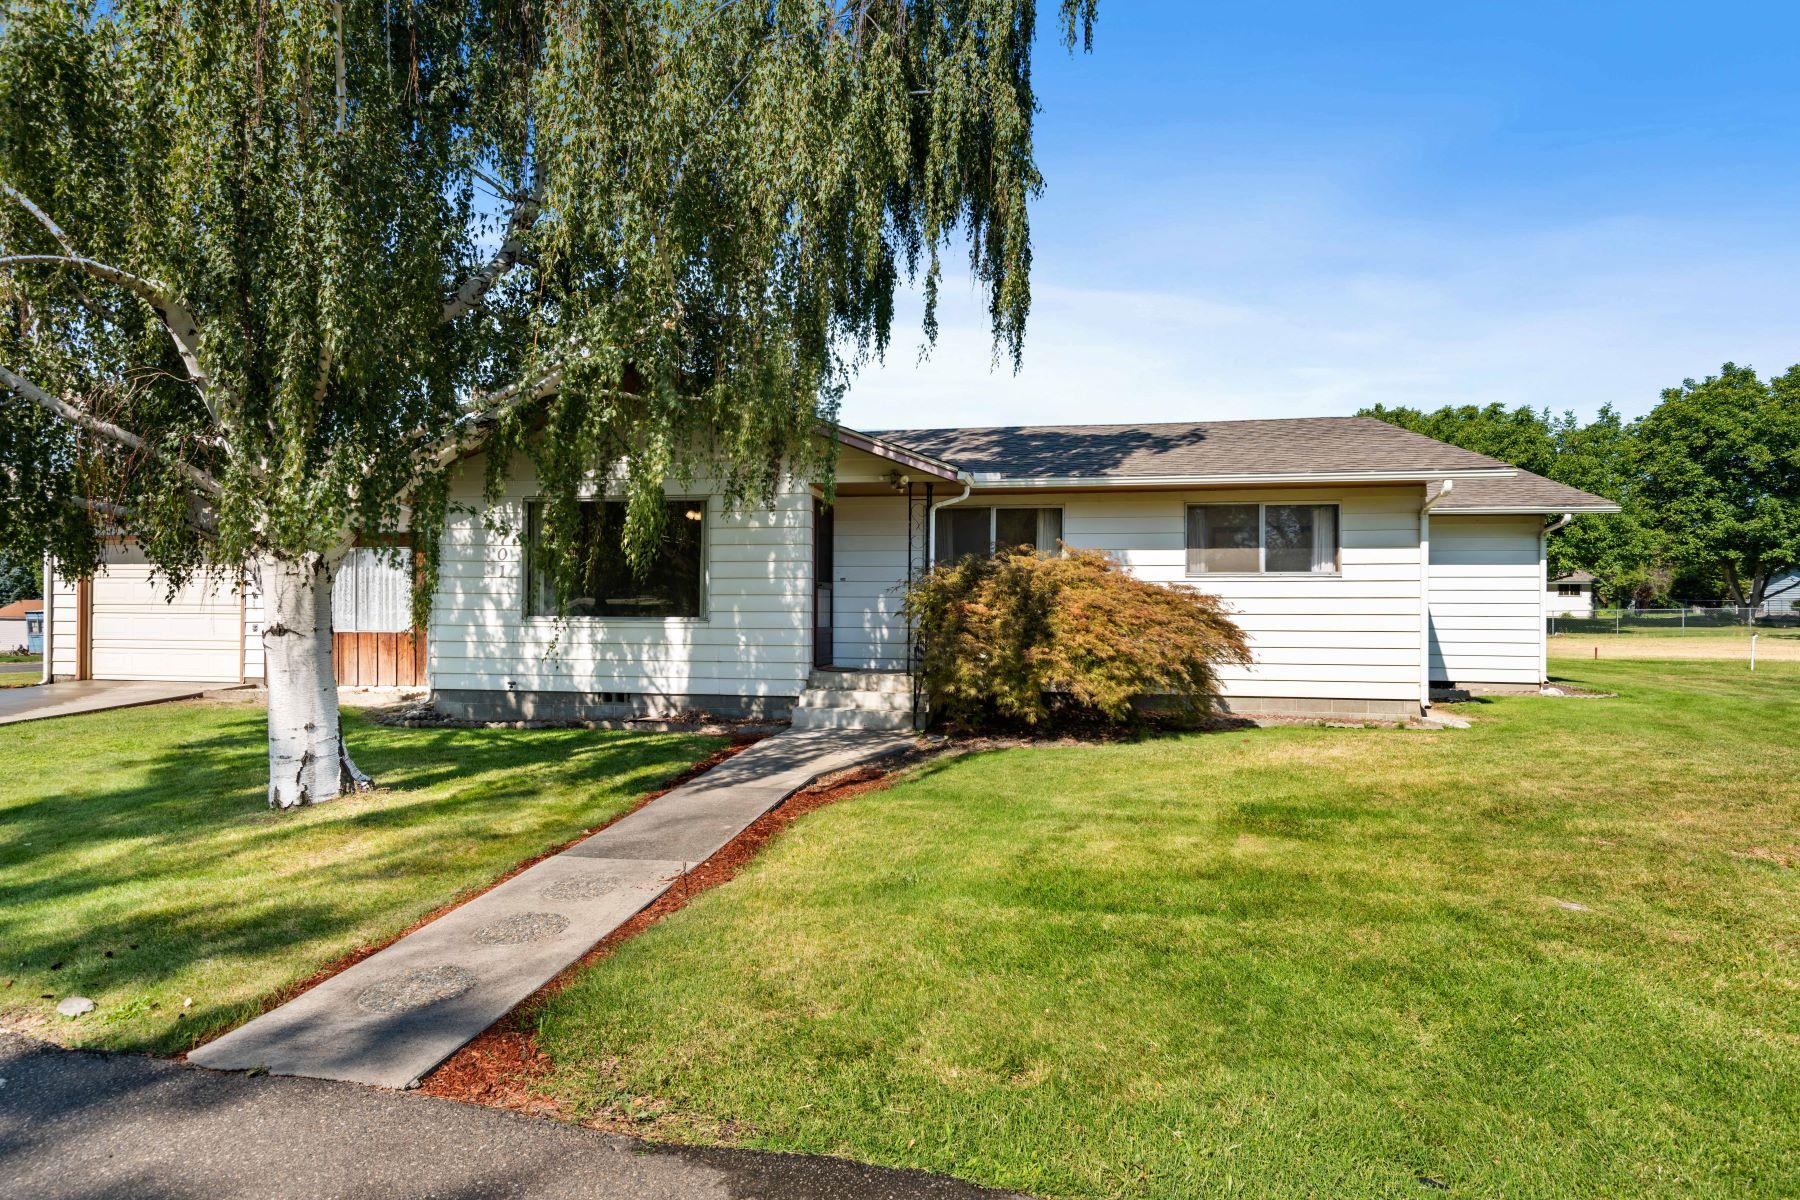 Single Family Homes for Sale at Serenity awaits... 701 11th Street Benton City, Washington 99320 United States